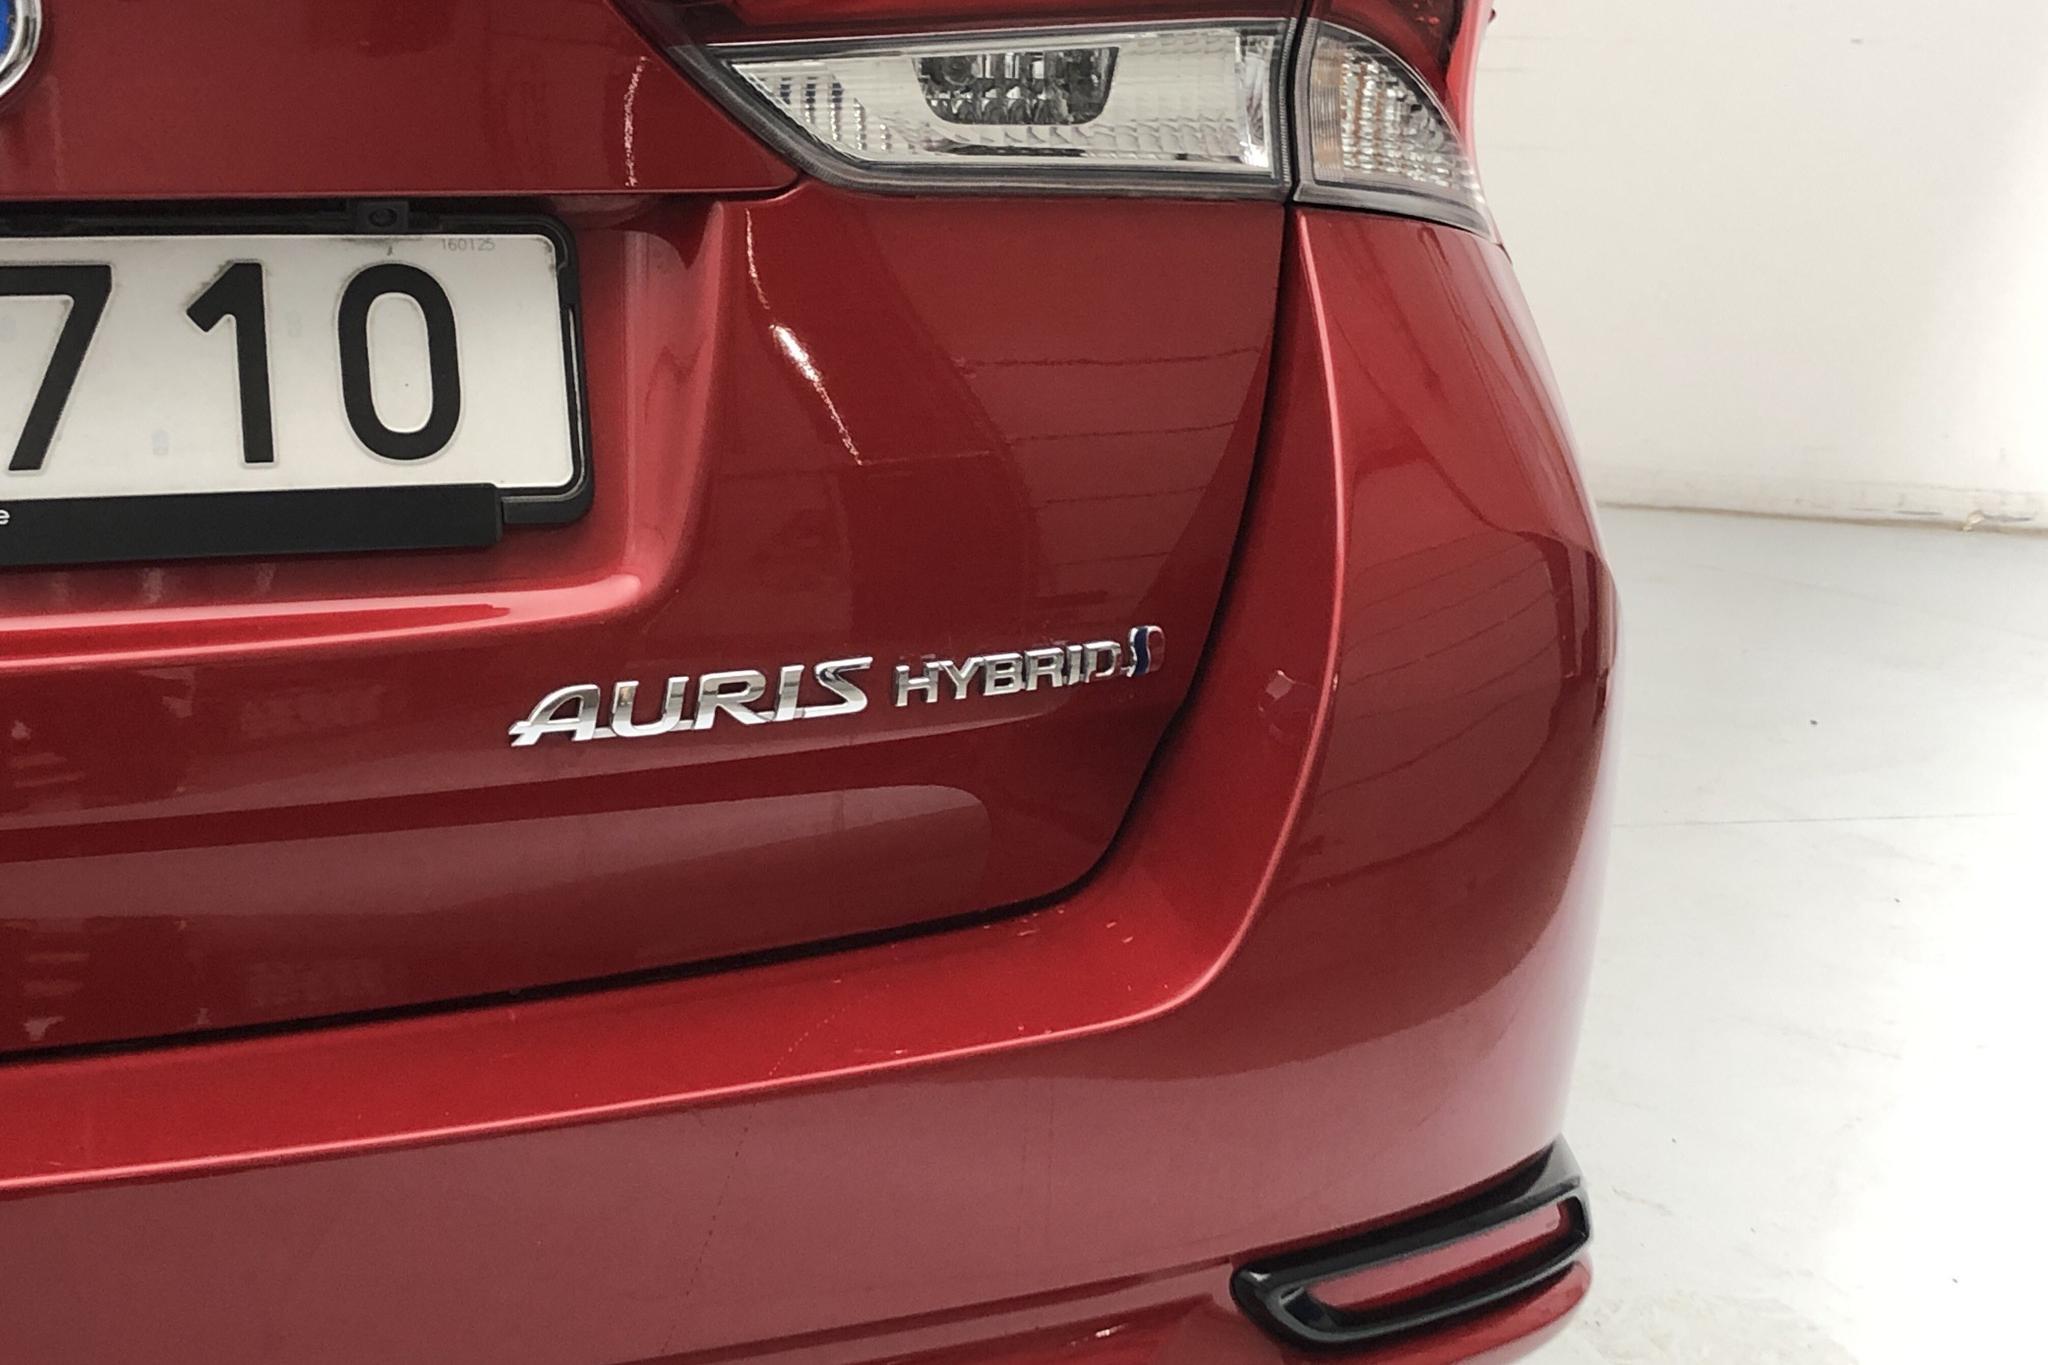 Toyota Auris 1.8 HSD Touring Sports (99hk) - 47 230 km - Automatic - Dark Red - 2016